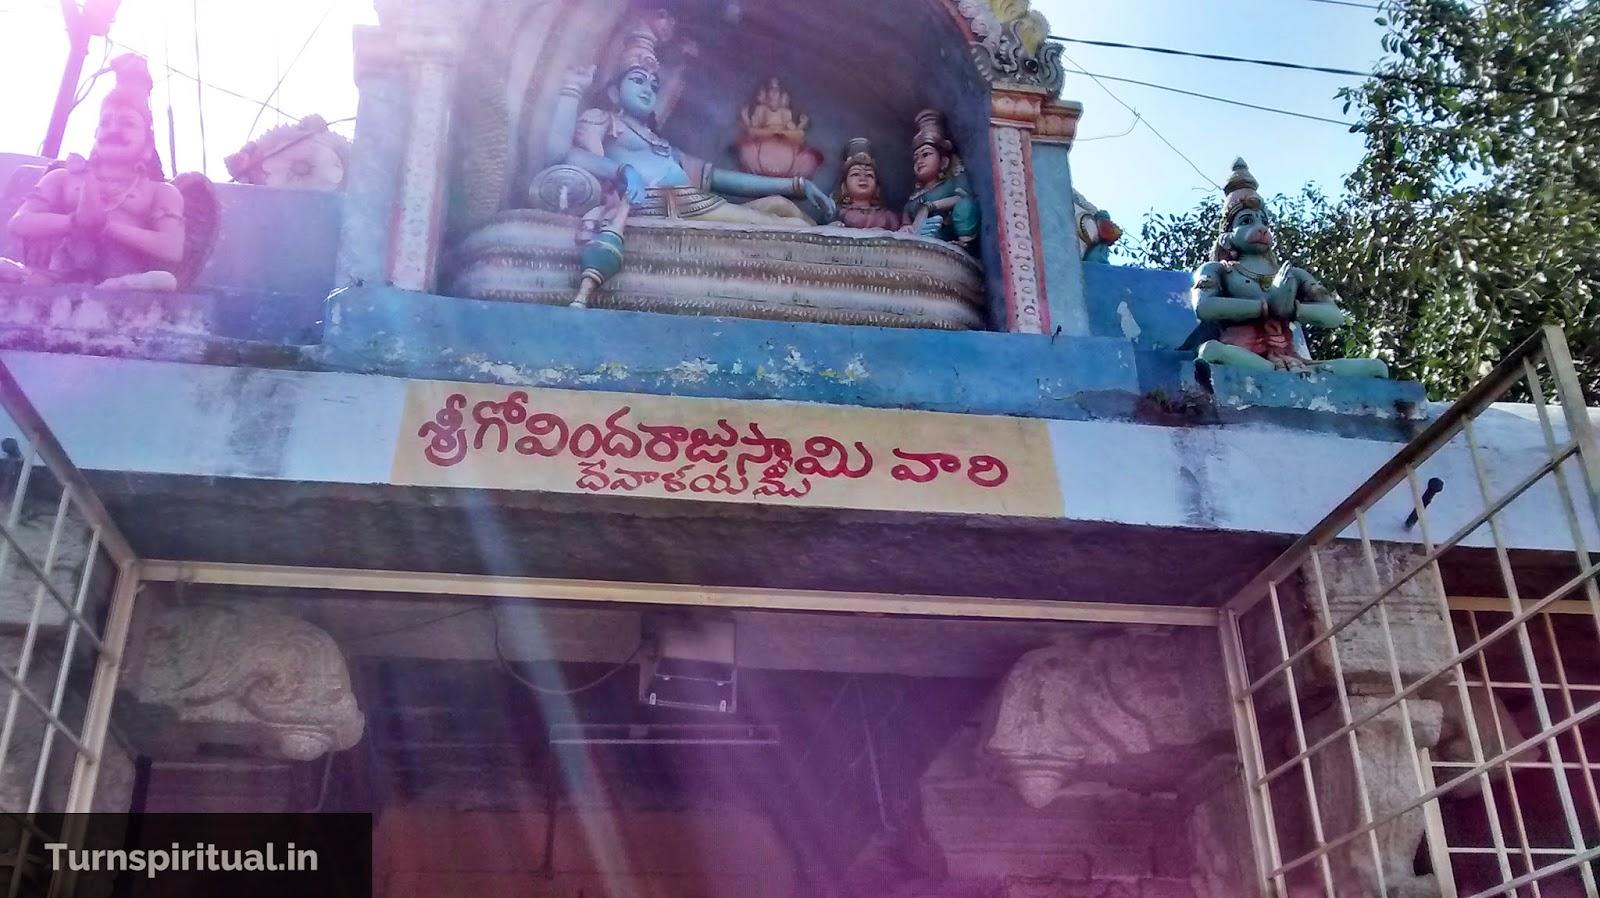 16 Photos of Kadiri ( Khadri ) Lakshmi Narasimha Swamy temple - Turn Spiritual, Turnspiritual.in